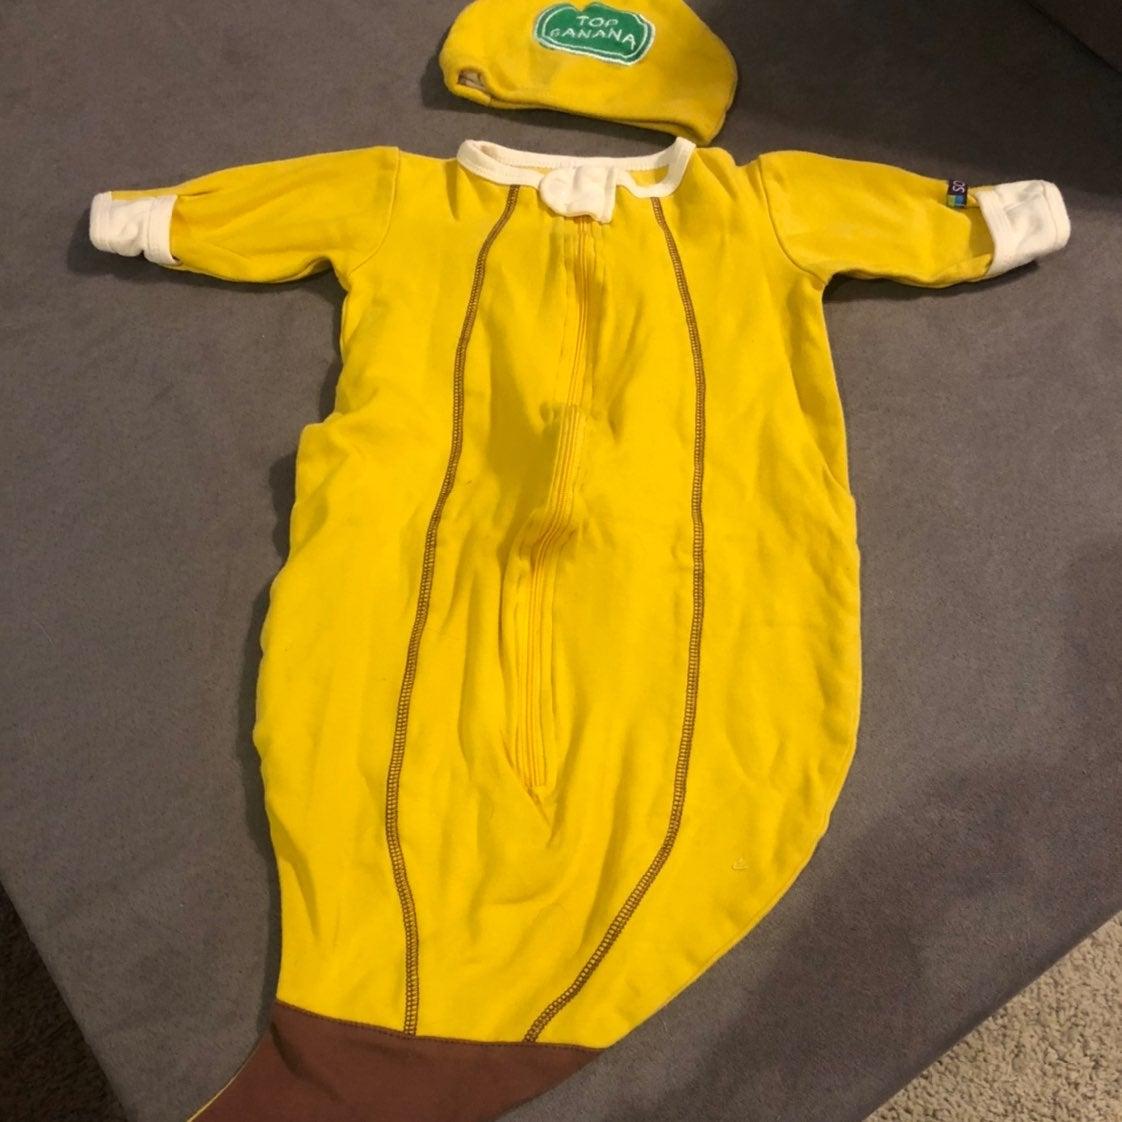 Baby banana halloween costume